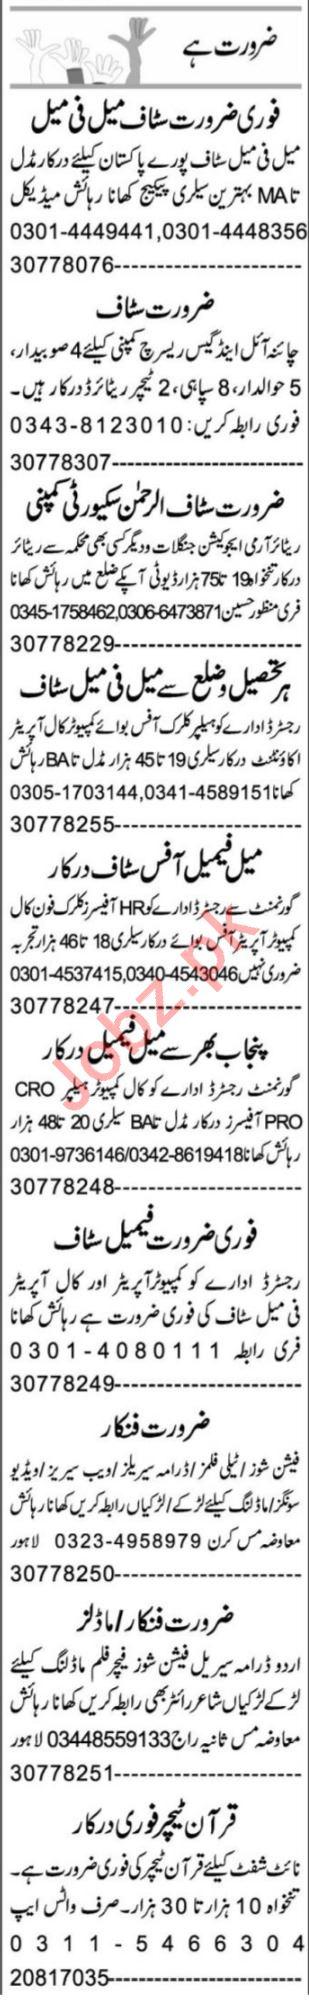 Express Sunday Rahim Yar Khan Classified Ads 4 July 2021